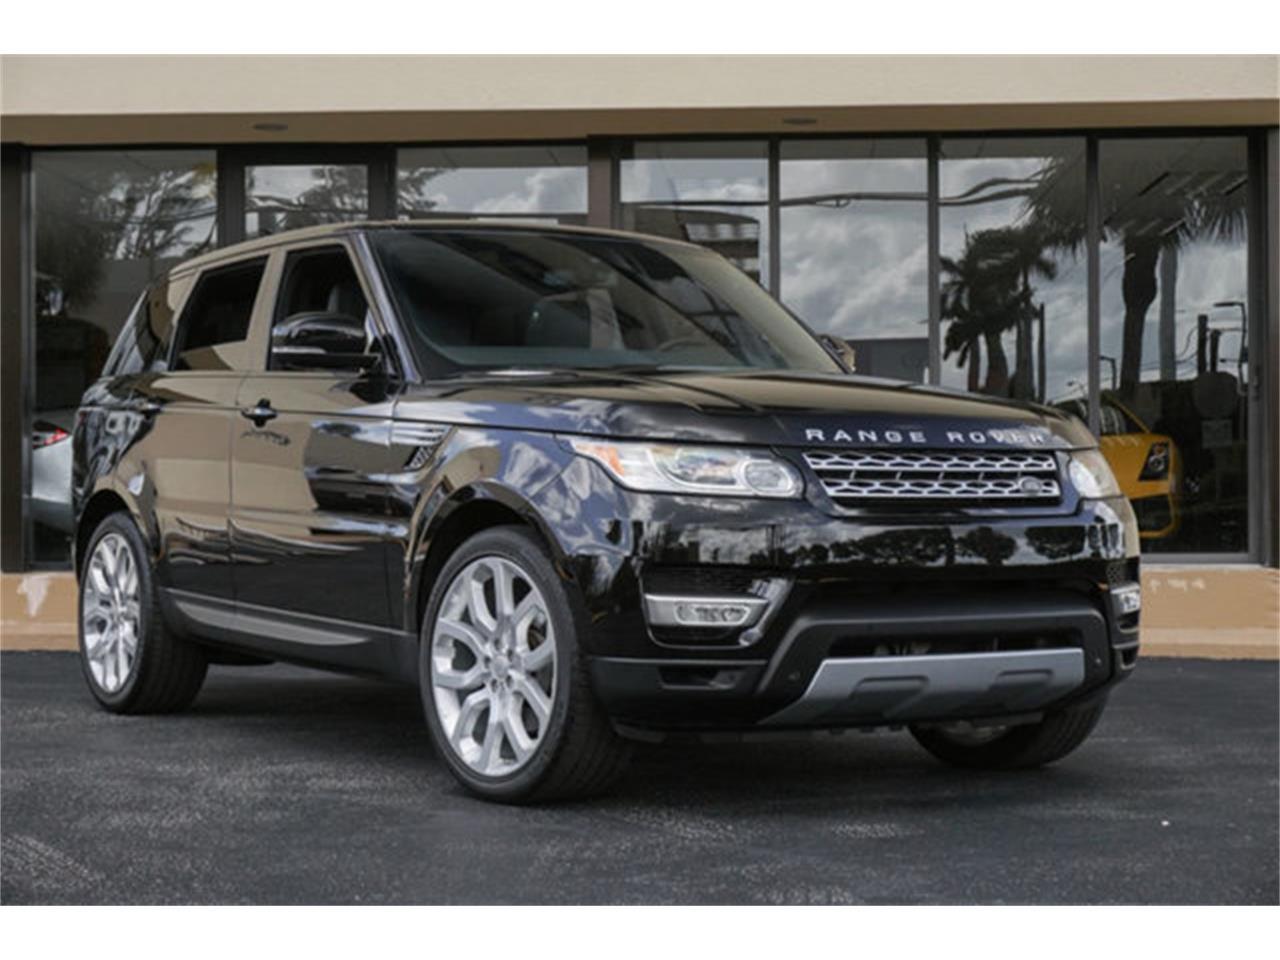 https://ccmarketplace.azureedge.net/cc-temp/listing/113/4633/13179432-2015-land-rover-range-rover-sport-thumb.jpg